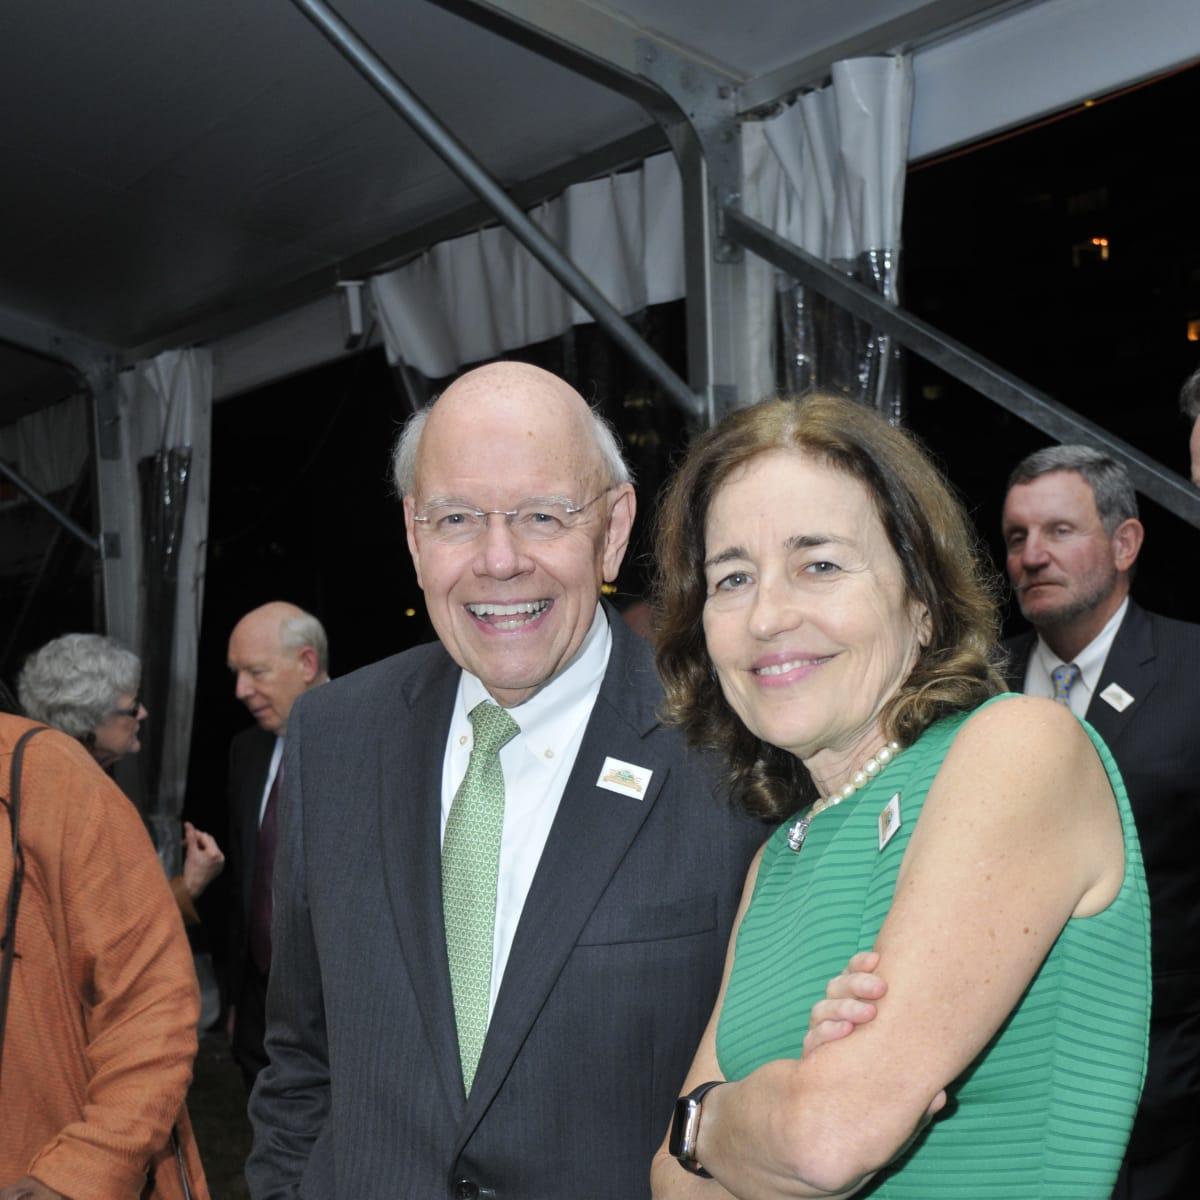 Hermann Park 100th Anny, March 2016, Bob Eury, Andrea White